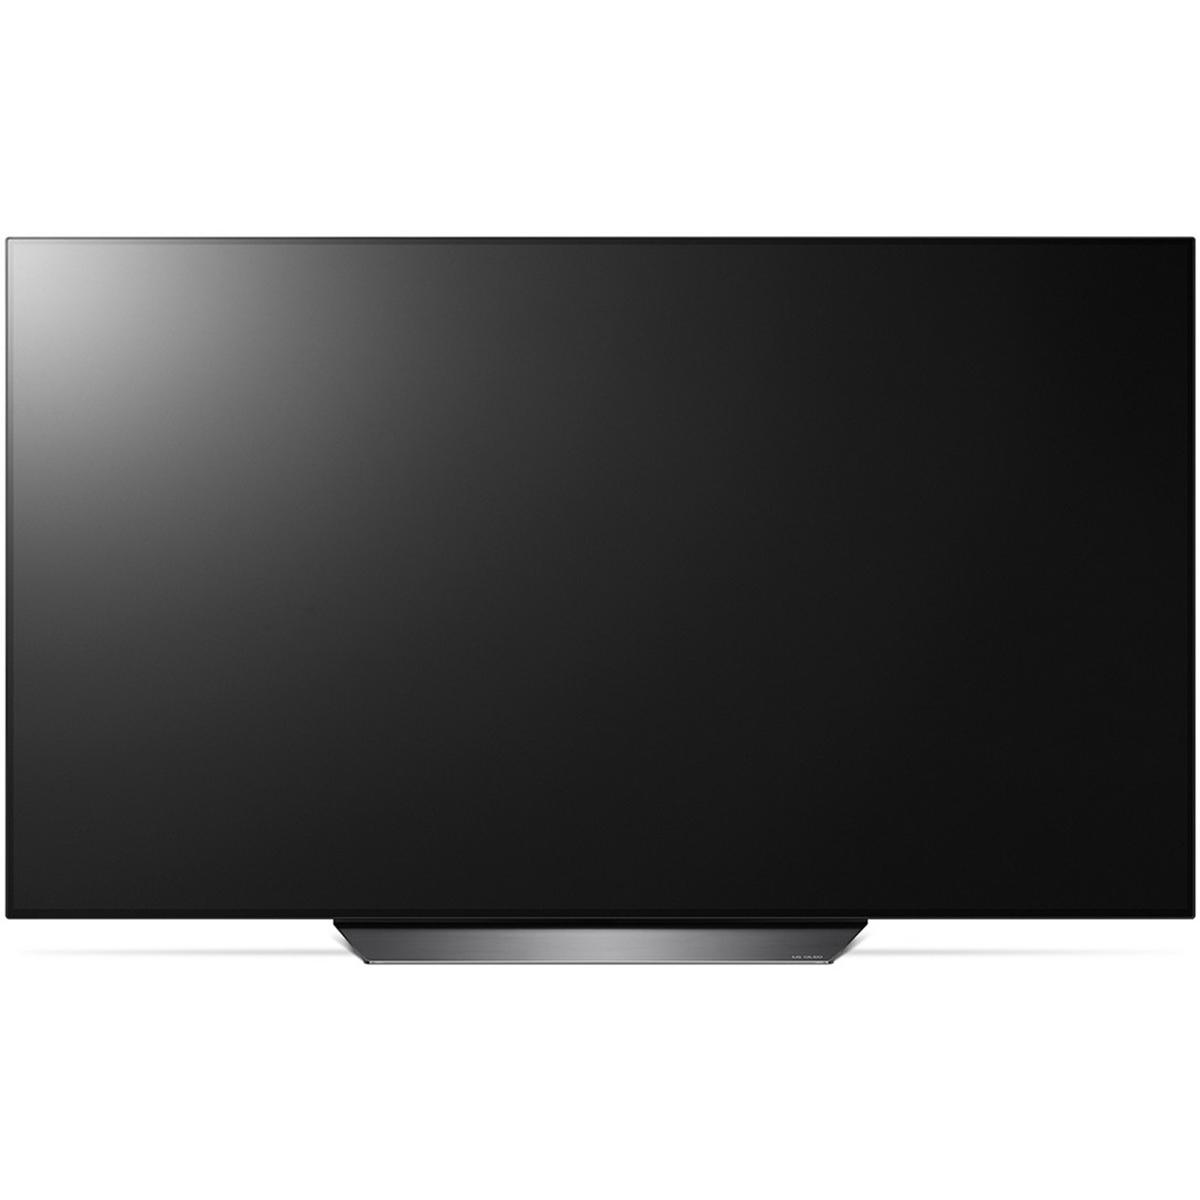 Buy Lg 4k Ultra Hd Oled Tv 55b8pva 55inch Online Lulu